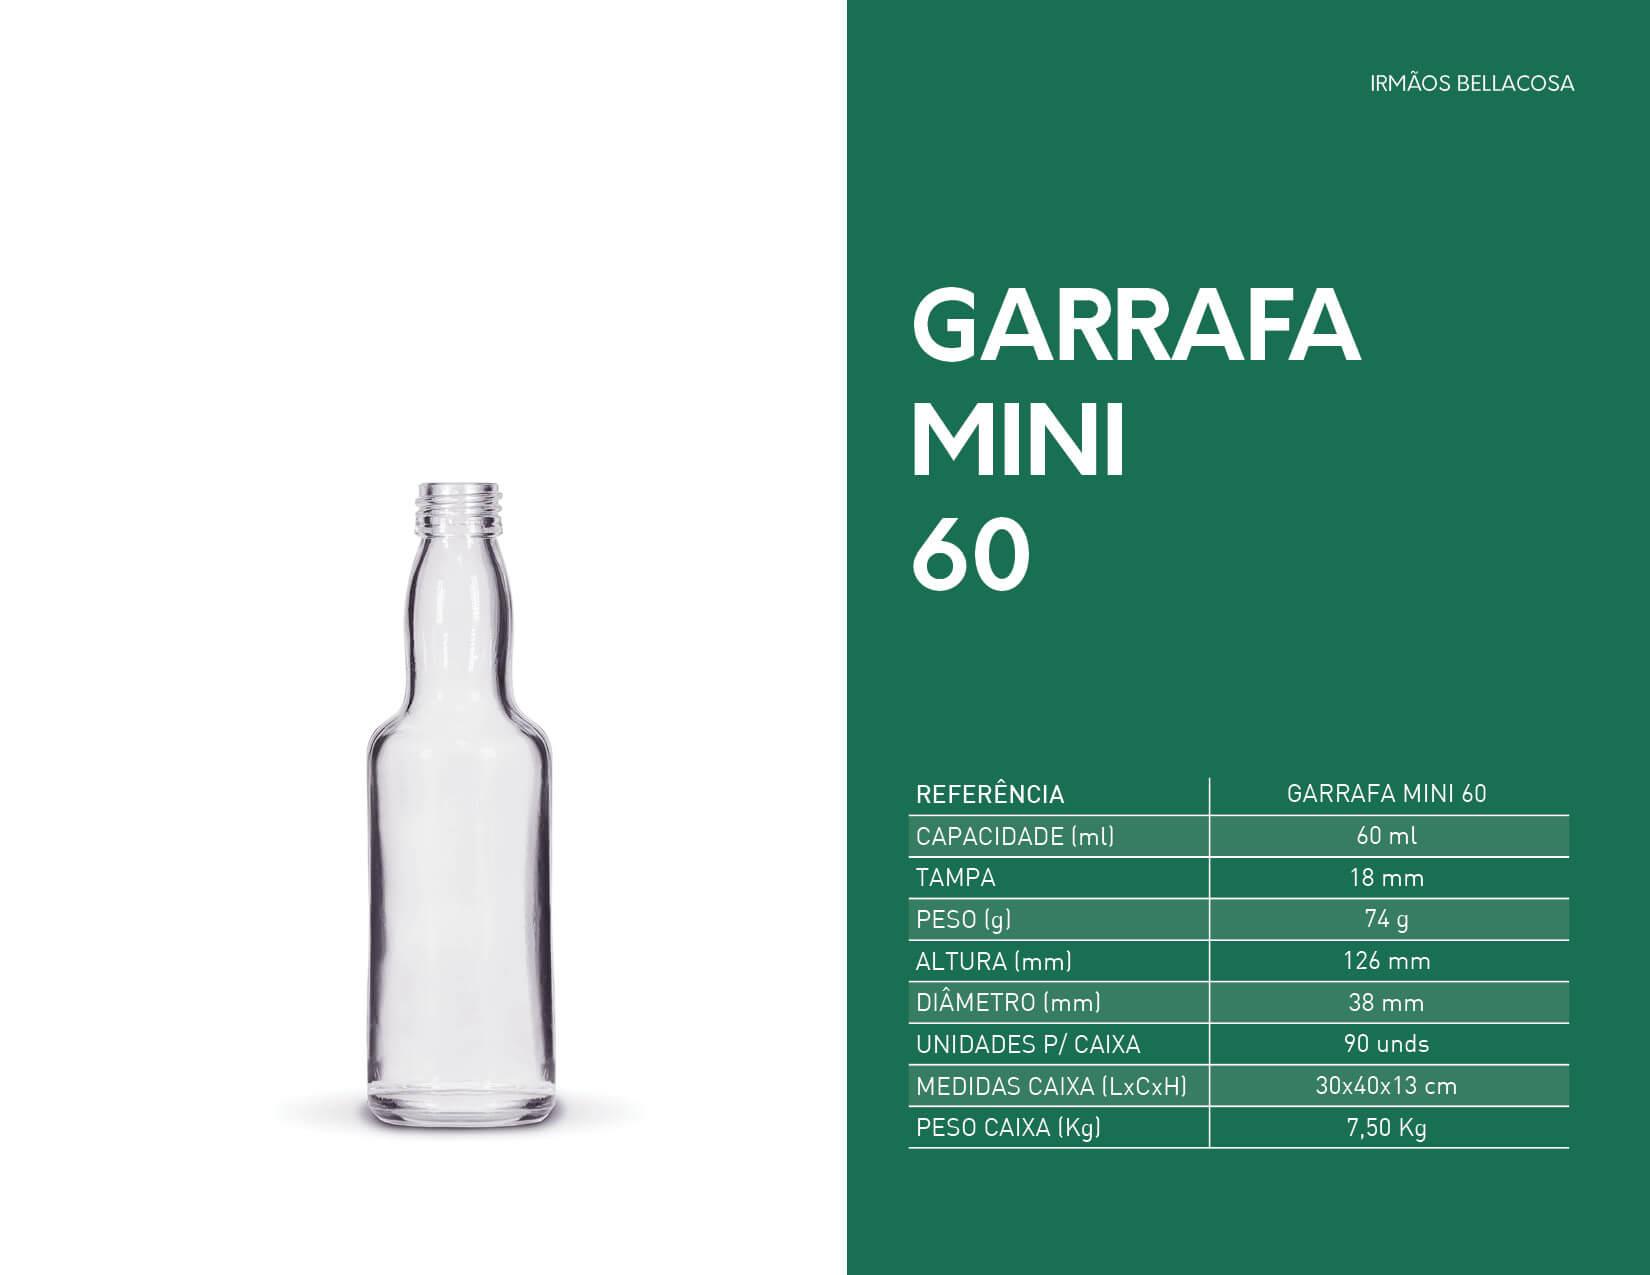 037-Garrafa-mini-60-irmaos-bellacosa-embalagens-de-vidro